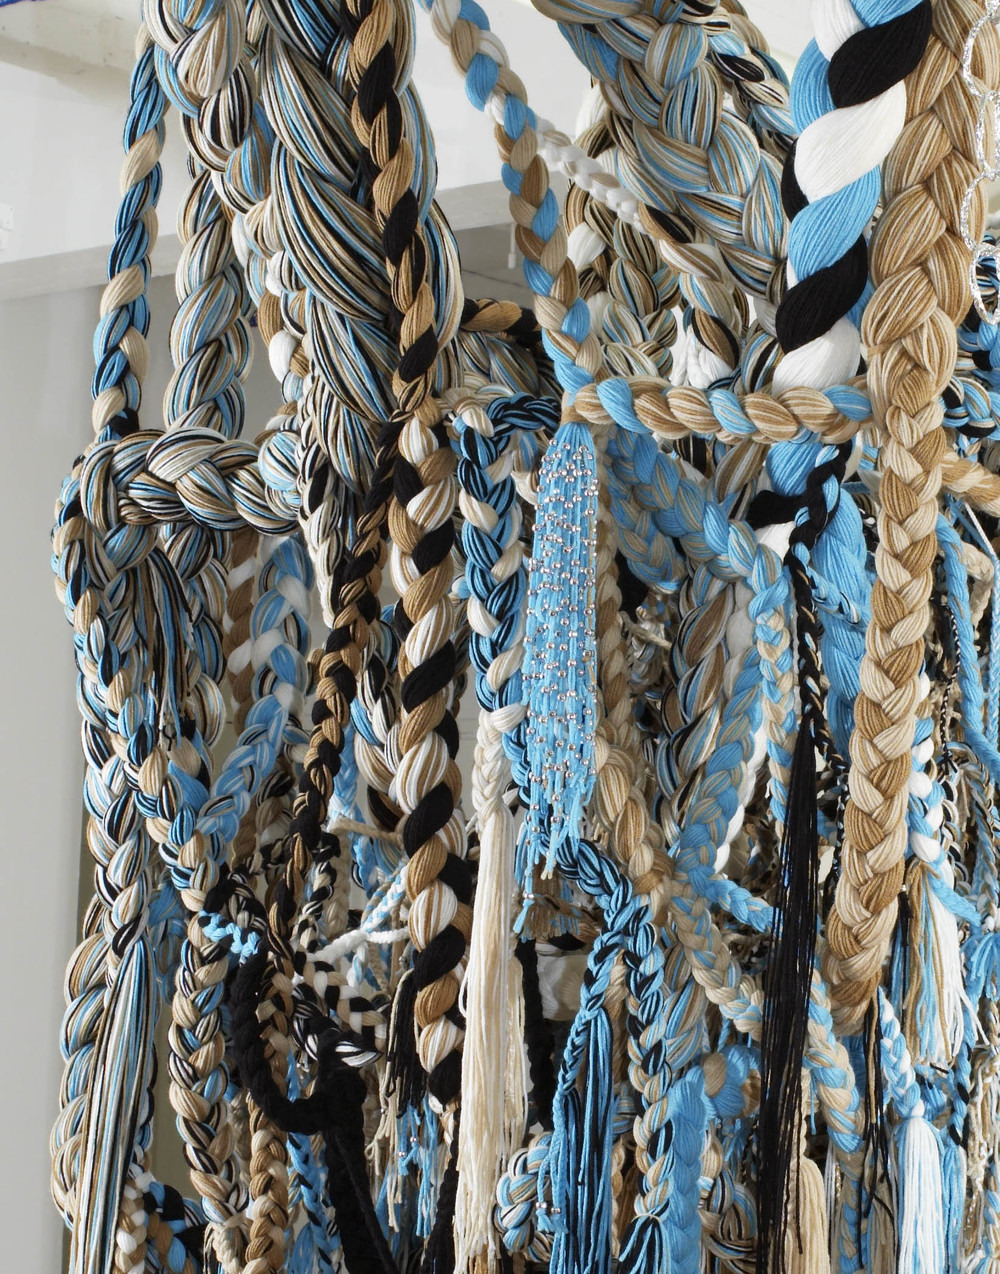 SQUASHblossom, 2007, Acrylic yarn, beads, tin foil, 5 x 6 x 7 feet (Detail)